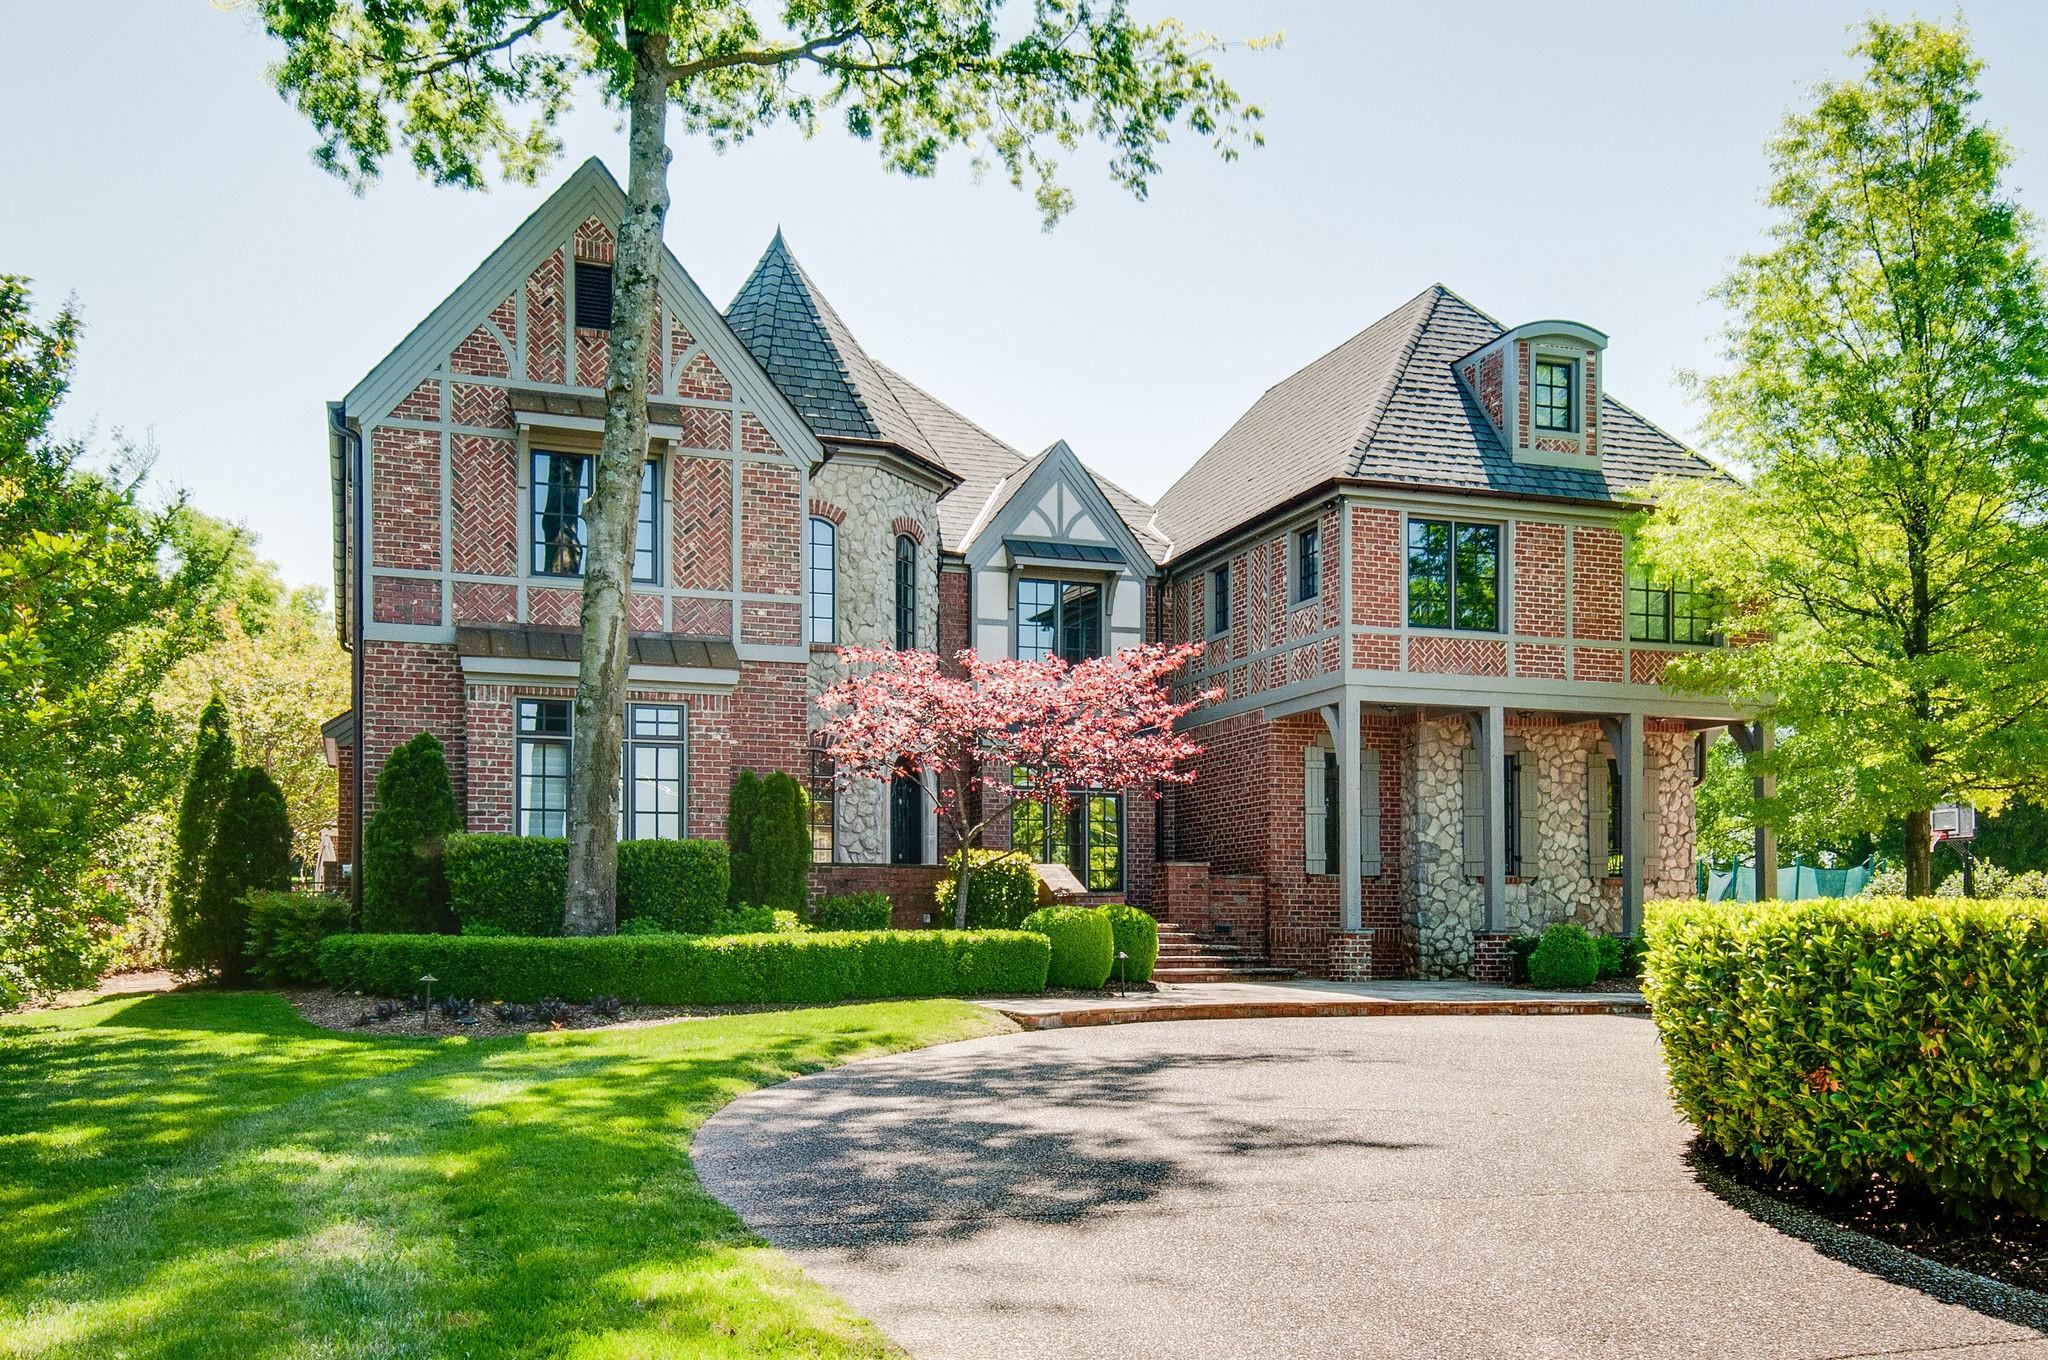 3442 Golf Club Ln, Nashville, TN 37215 - Nashville, TN real estate listing